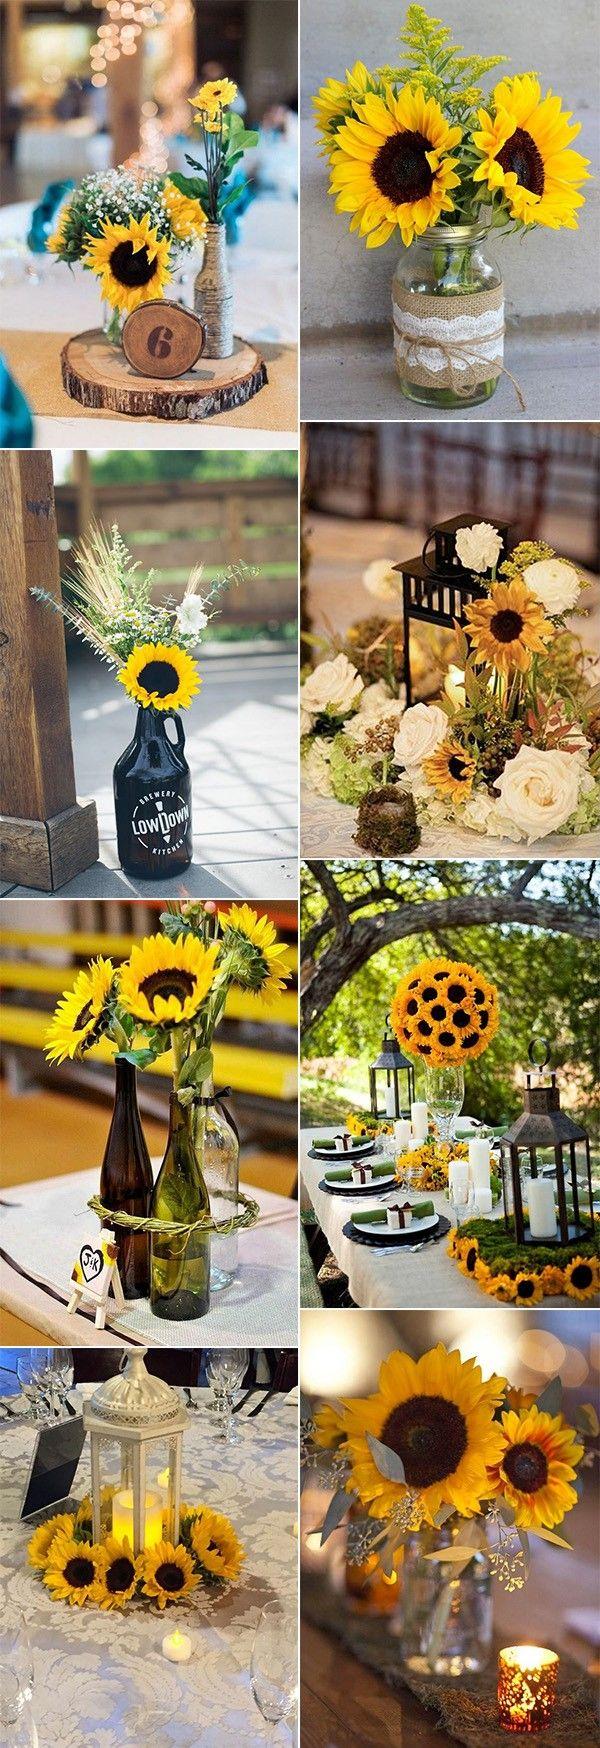 Wedding decorations outside house february 2019  best September   Wedding images on Pinterest